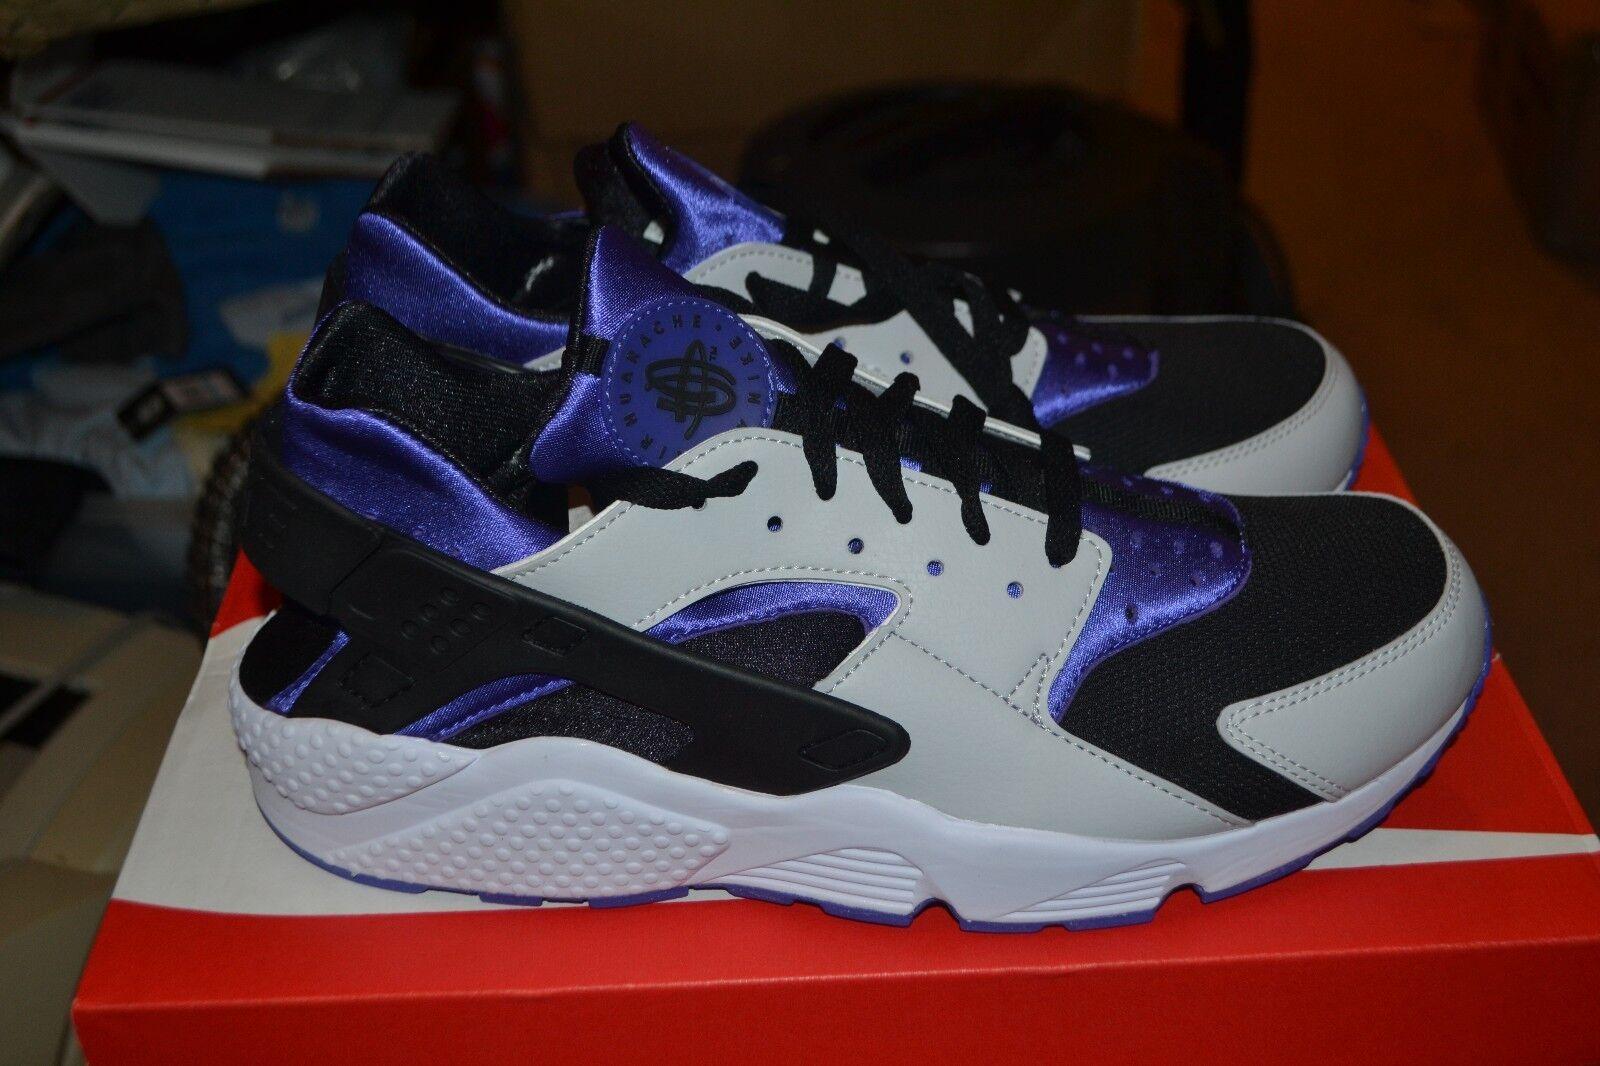 Nike Air Huarache [318429-501] NSW Running Persian Violet/Platinum-Black SZ 12